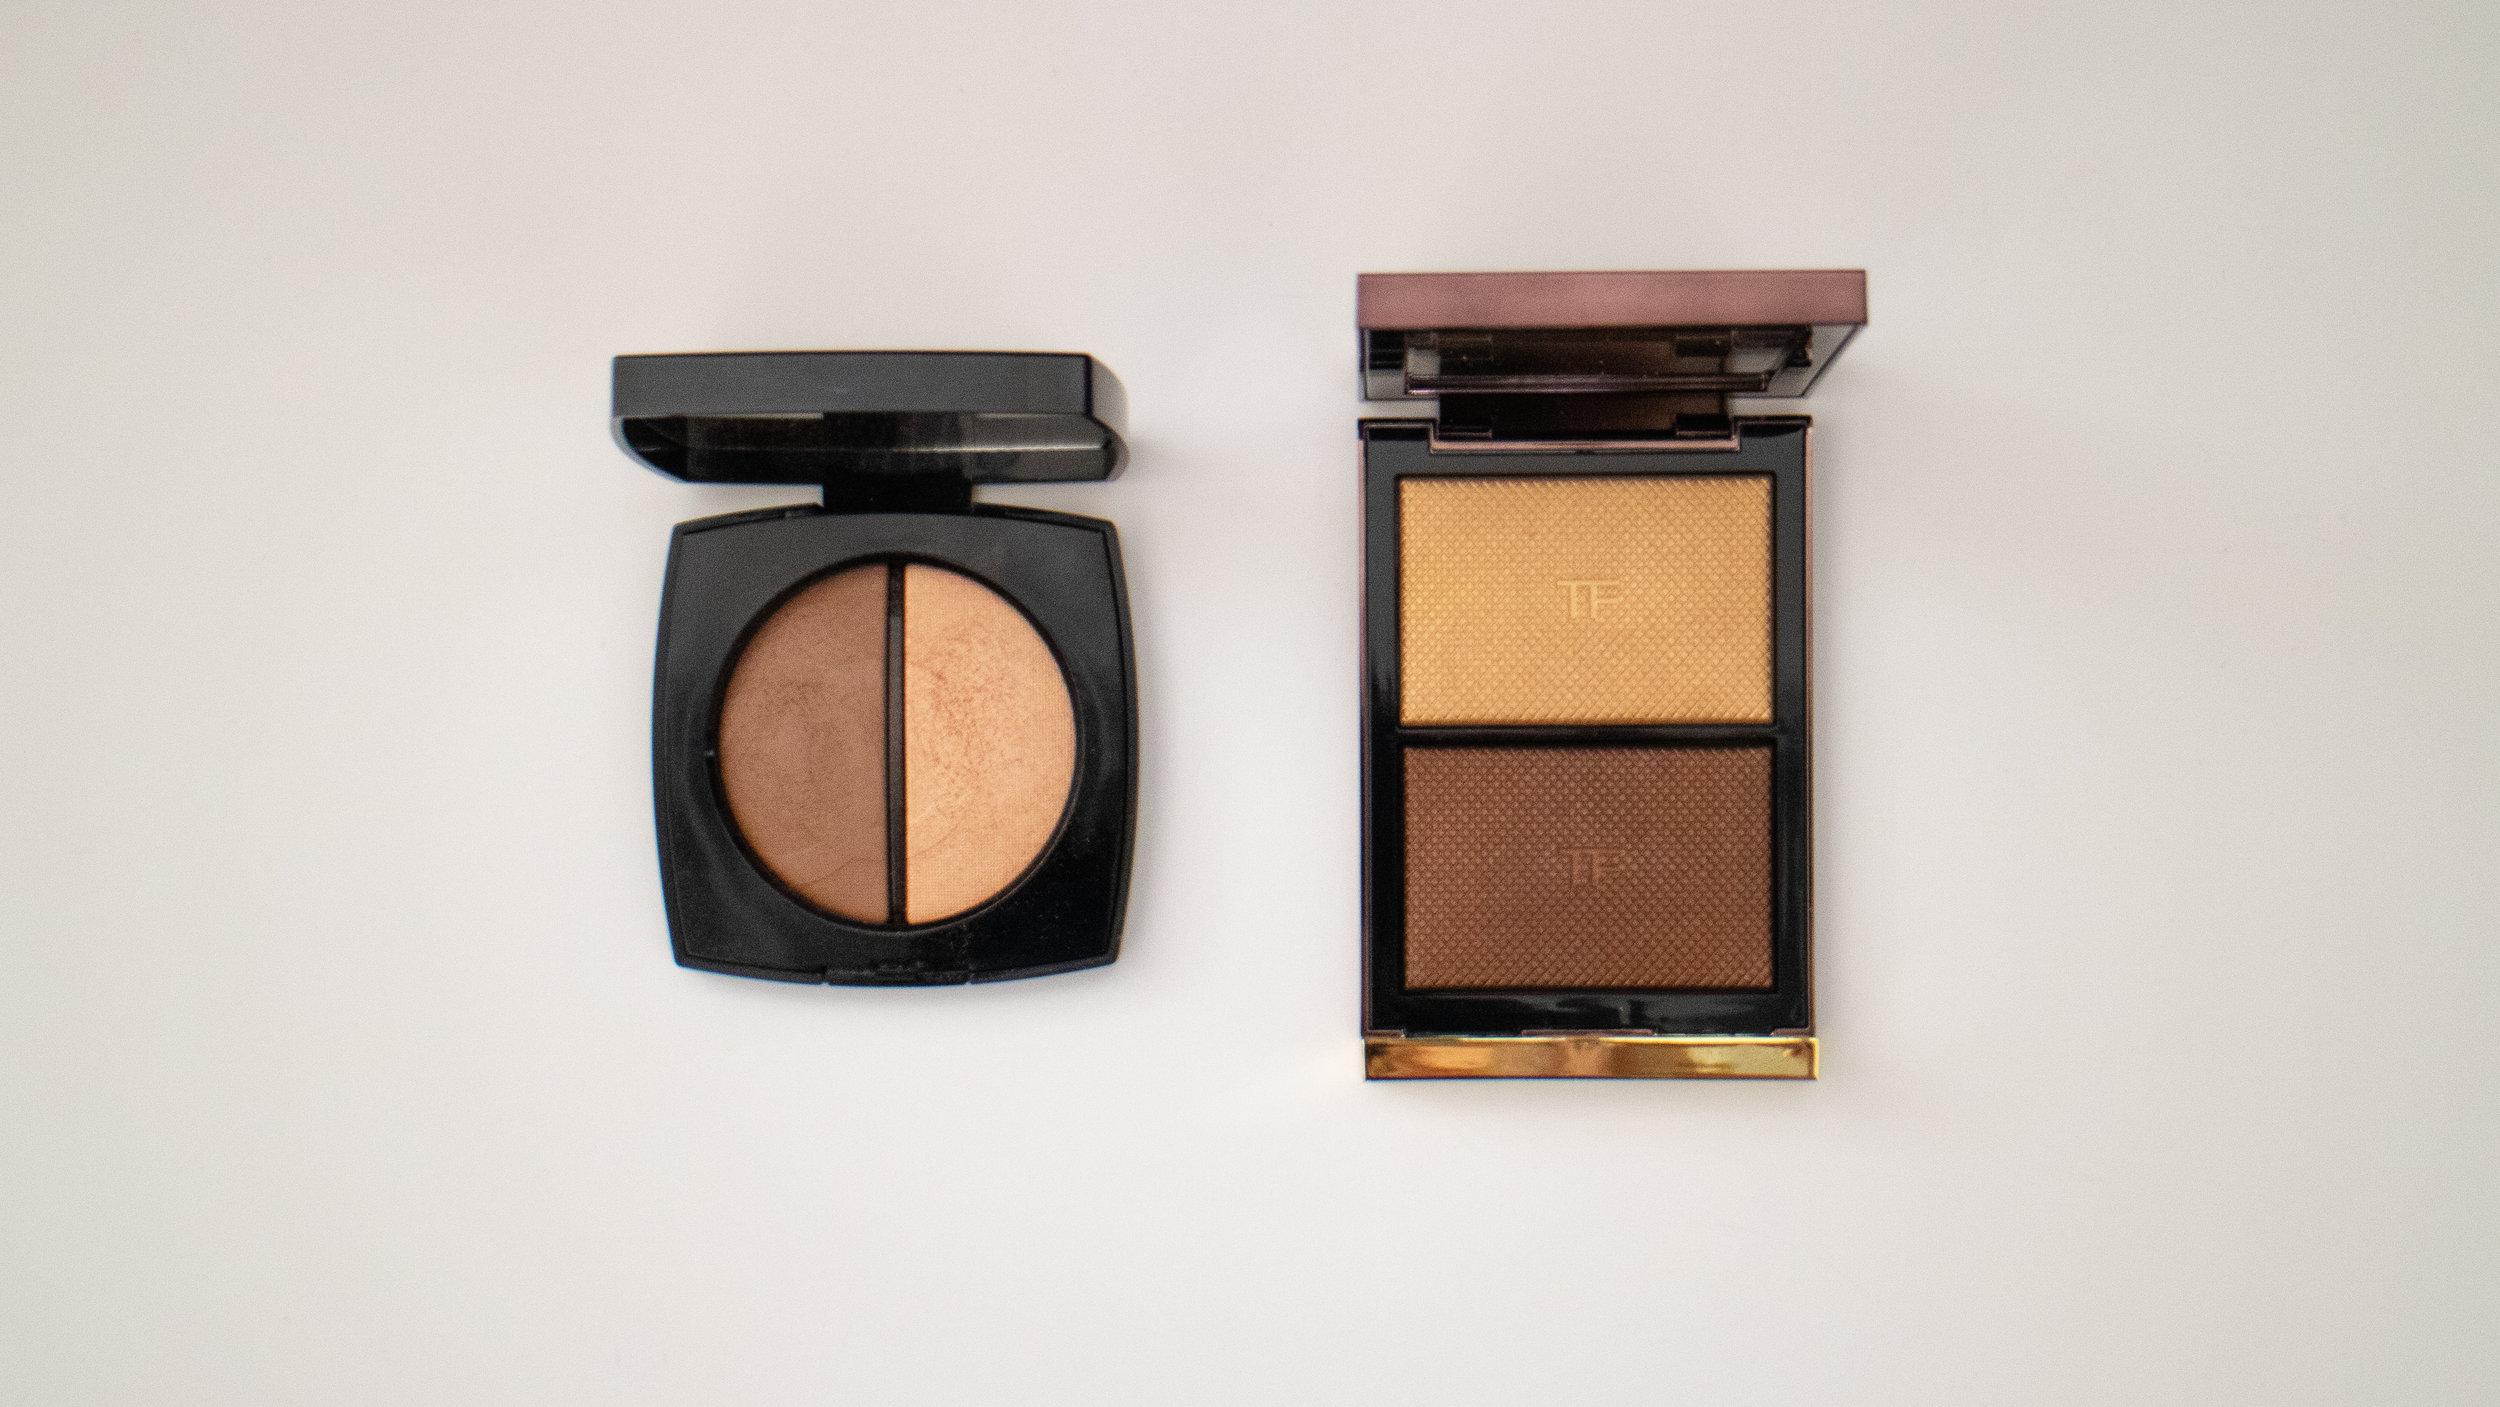 Chanel Bronzer and Highlighter Duo in Medium (L), Tom Ford Skin Illuminating Powder Duo in Flicker (R)